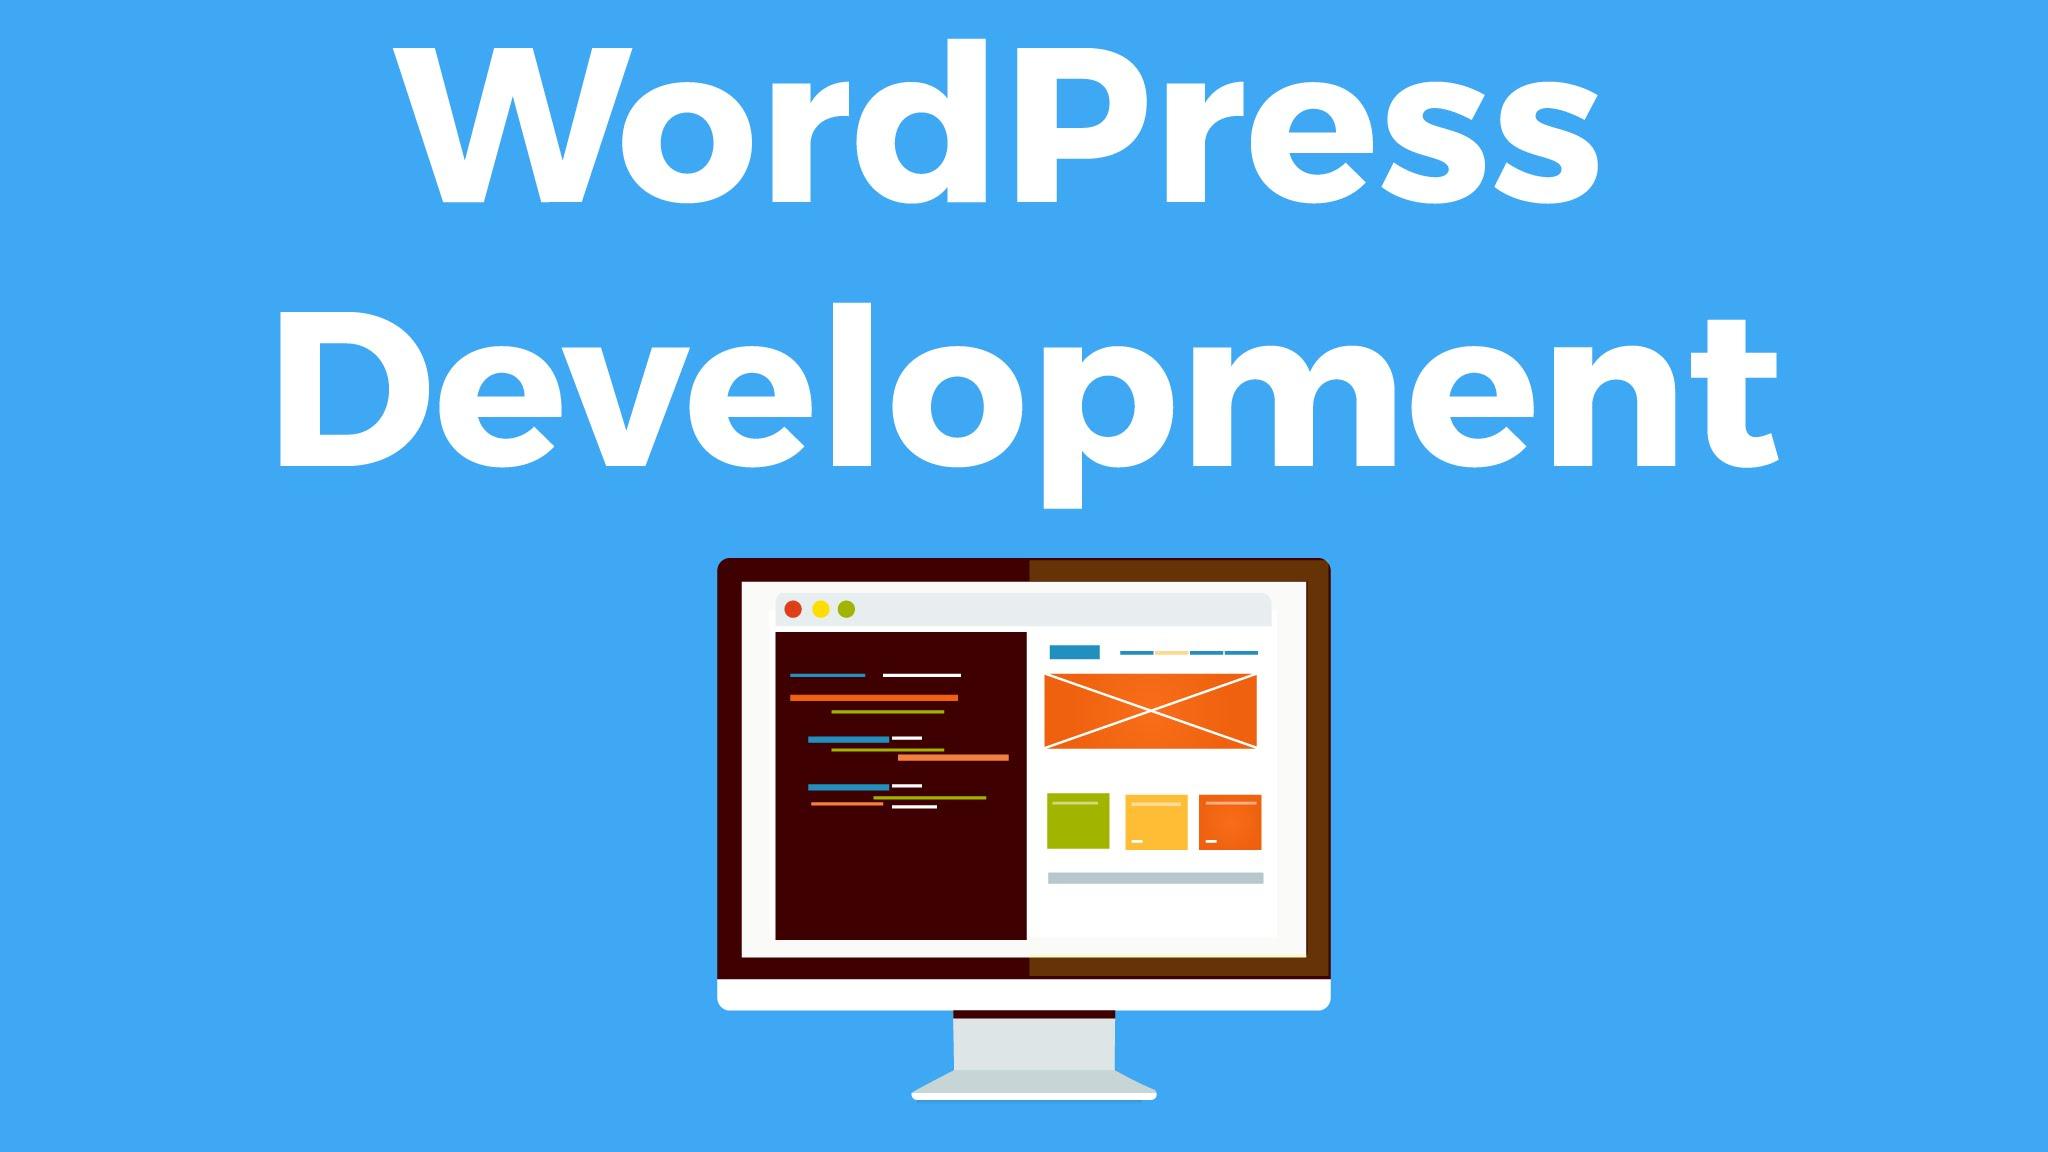 WordPress Development - Create WordPress Themes and Plugins